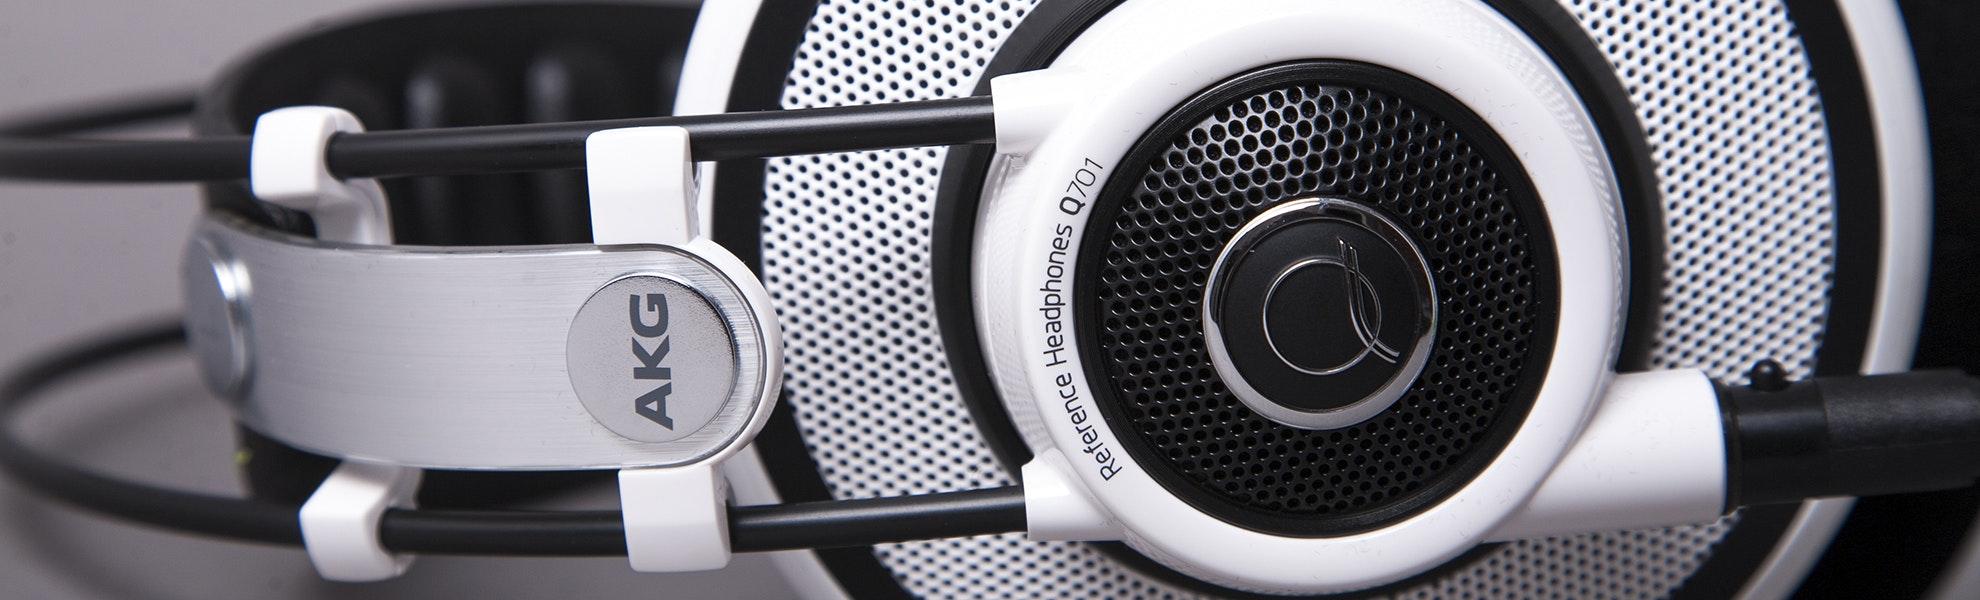 AKG Q701 Audiophile Headphones